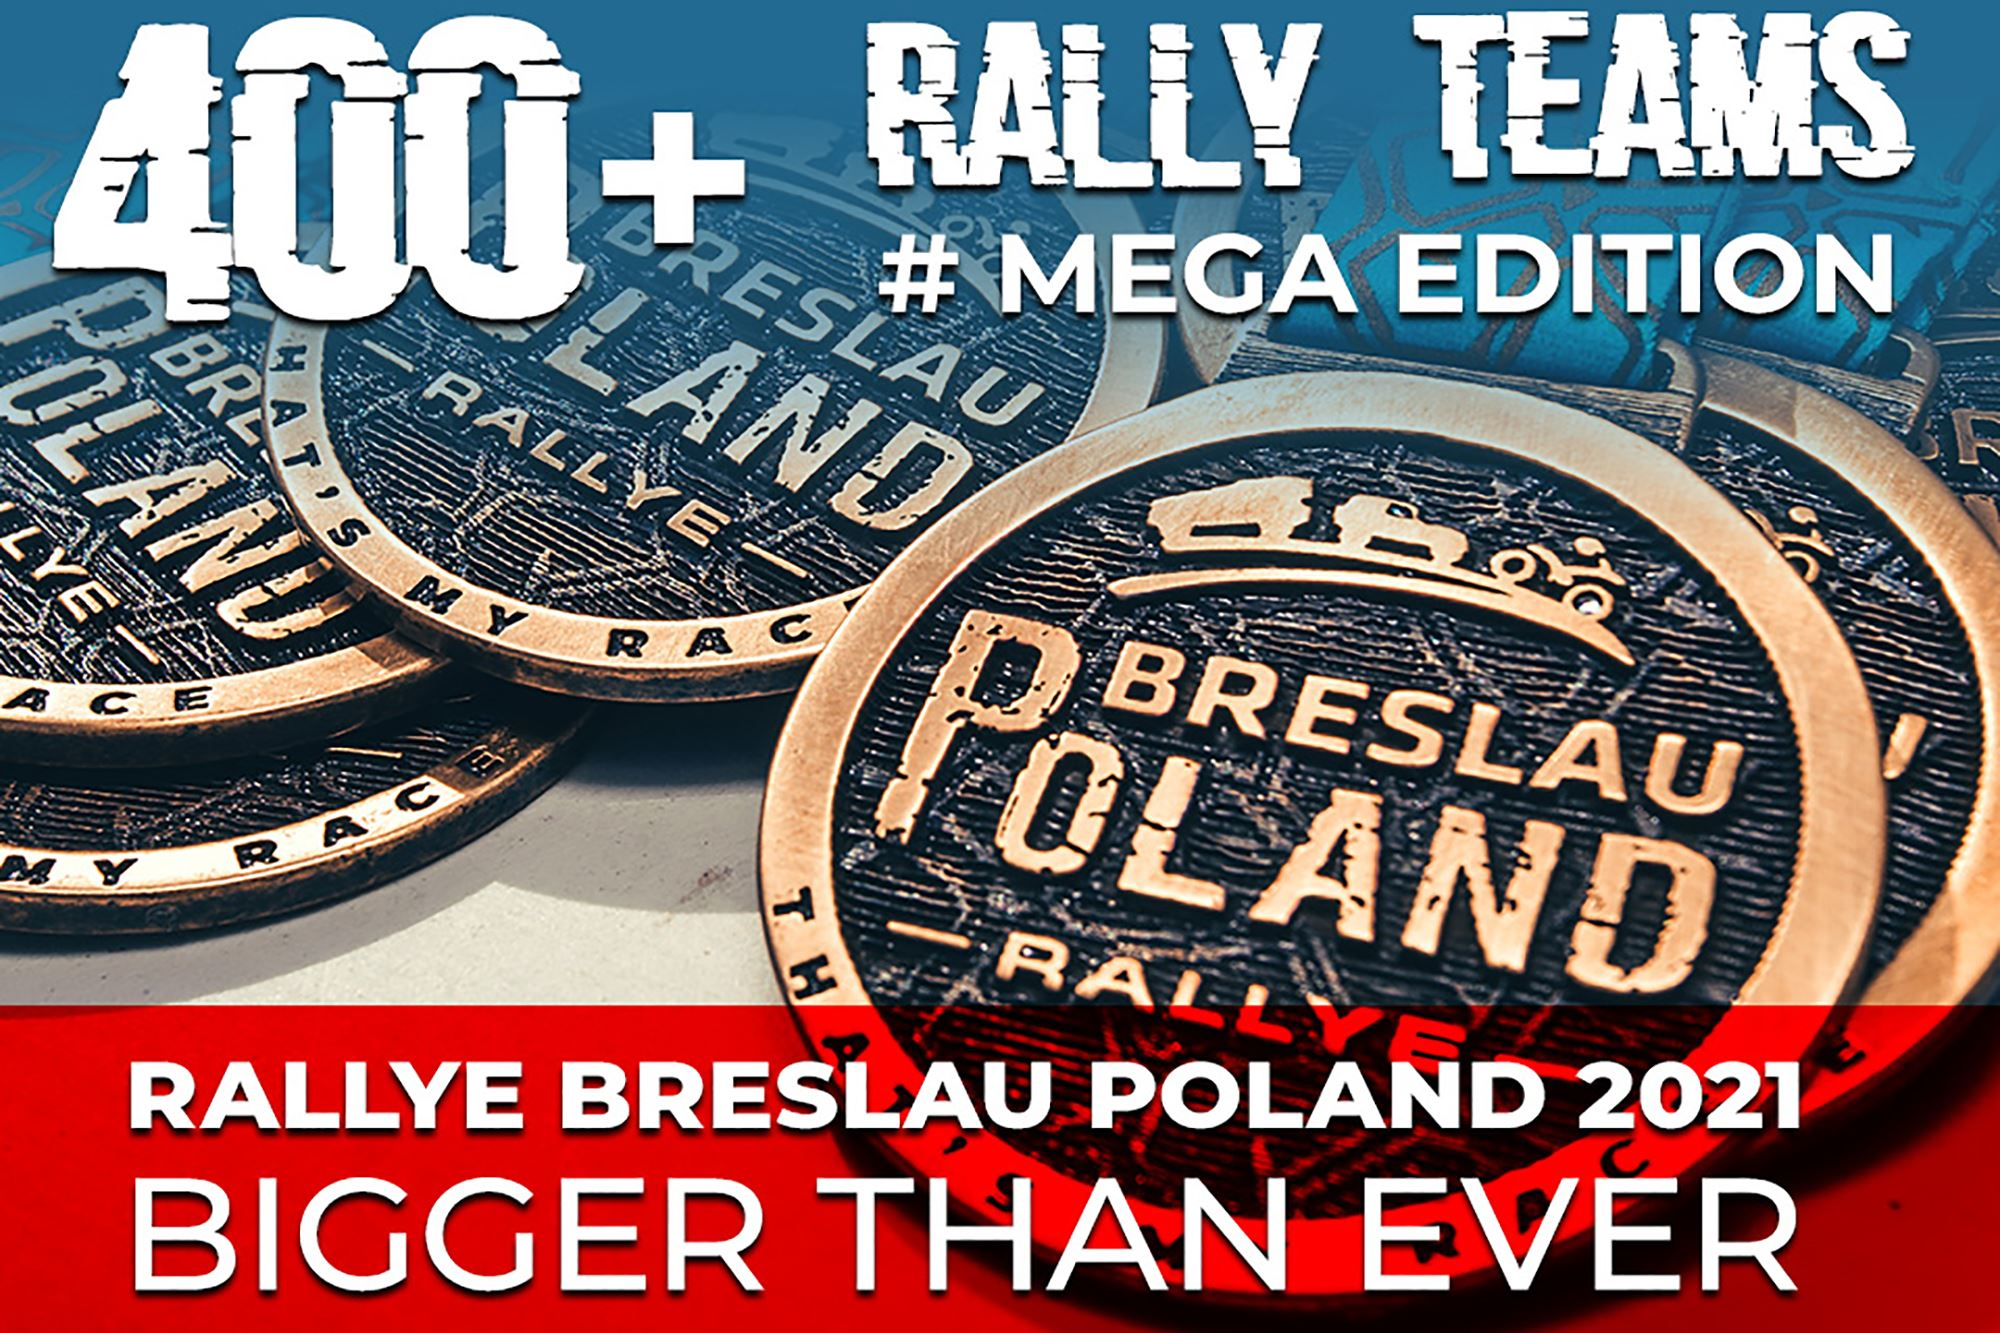 Rallye Breslau Poland 2021: the Mega Edition